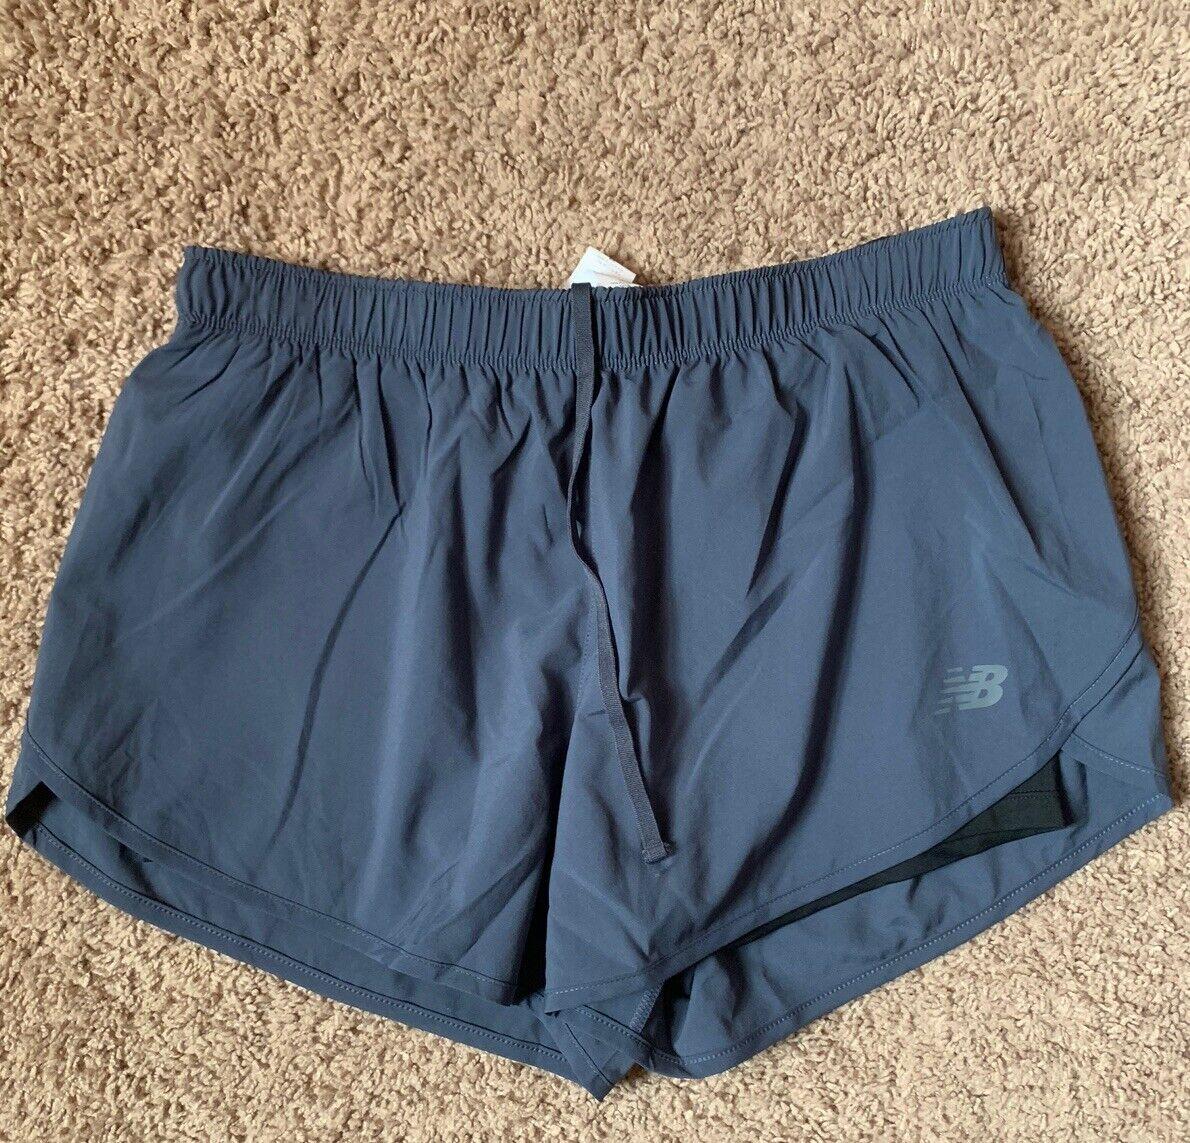 NEW BALANCE Gray Lined Active Wear Running Shorts Women's Size Medium